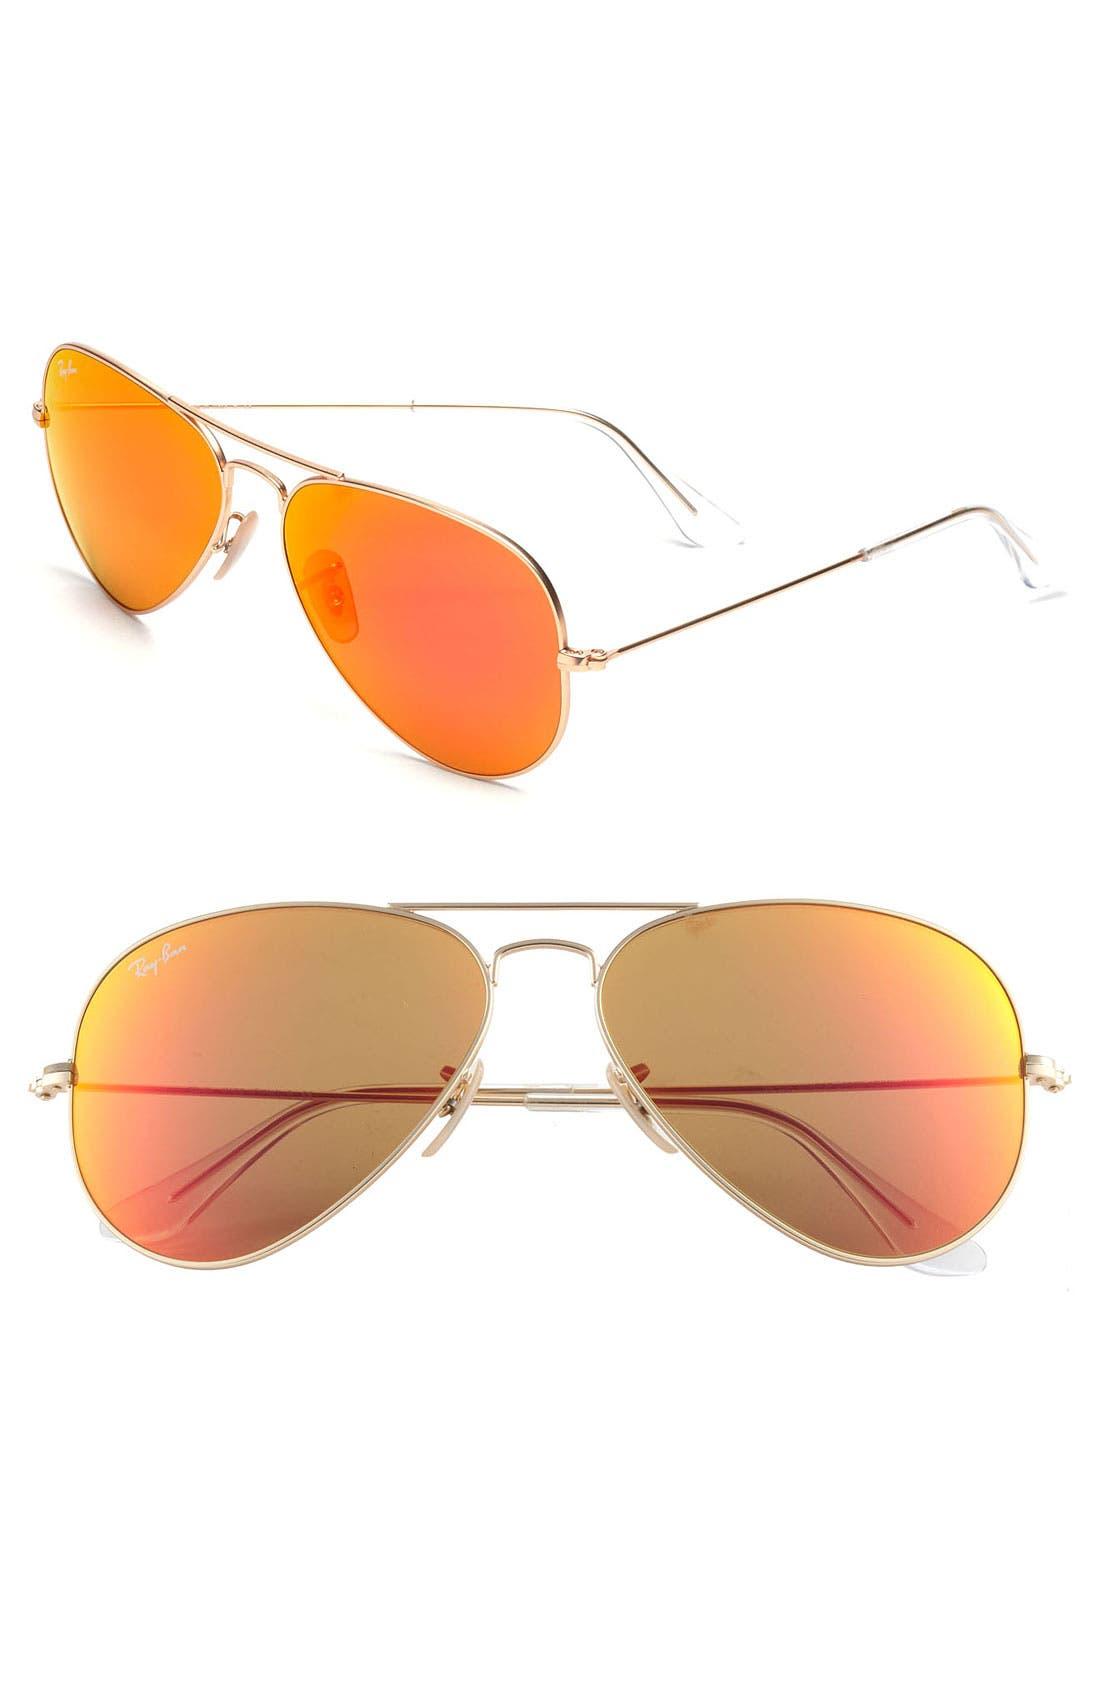 Ray-Ban Standard Original 5m Aviator Sunglasses - Gold/ Brown